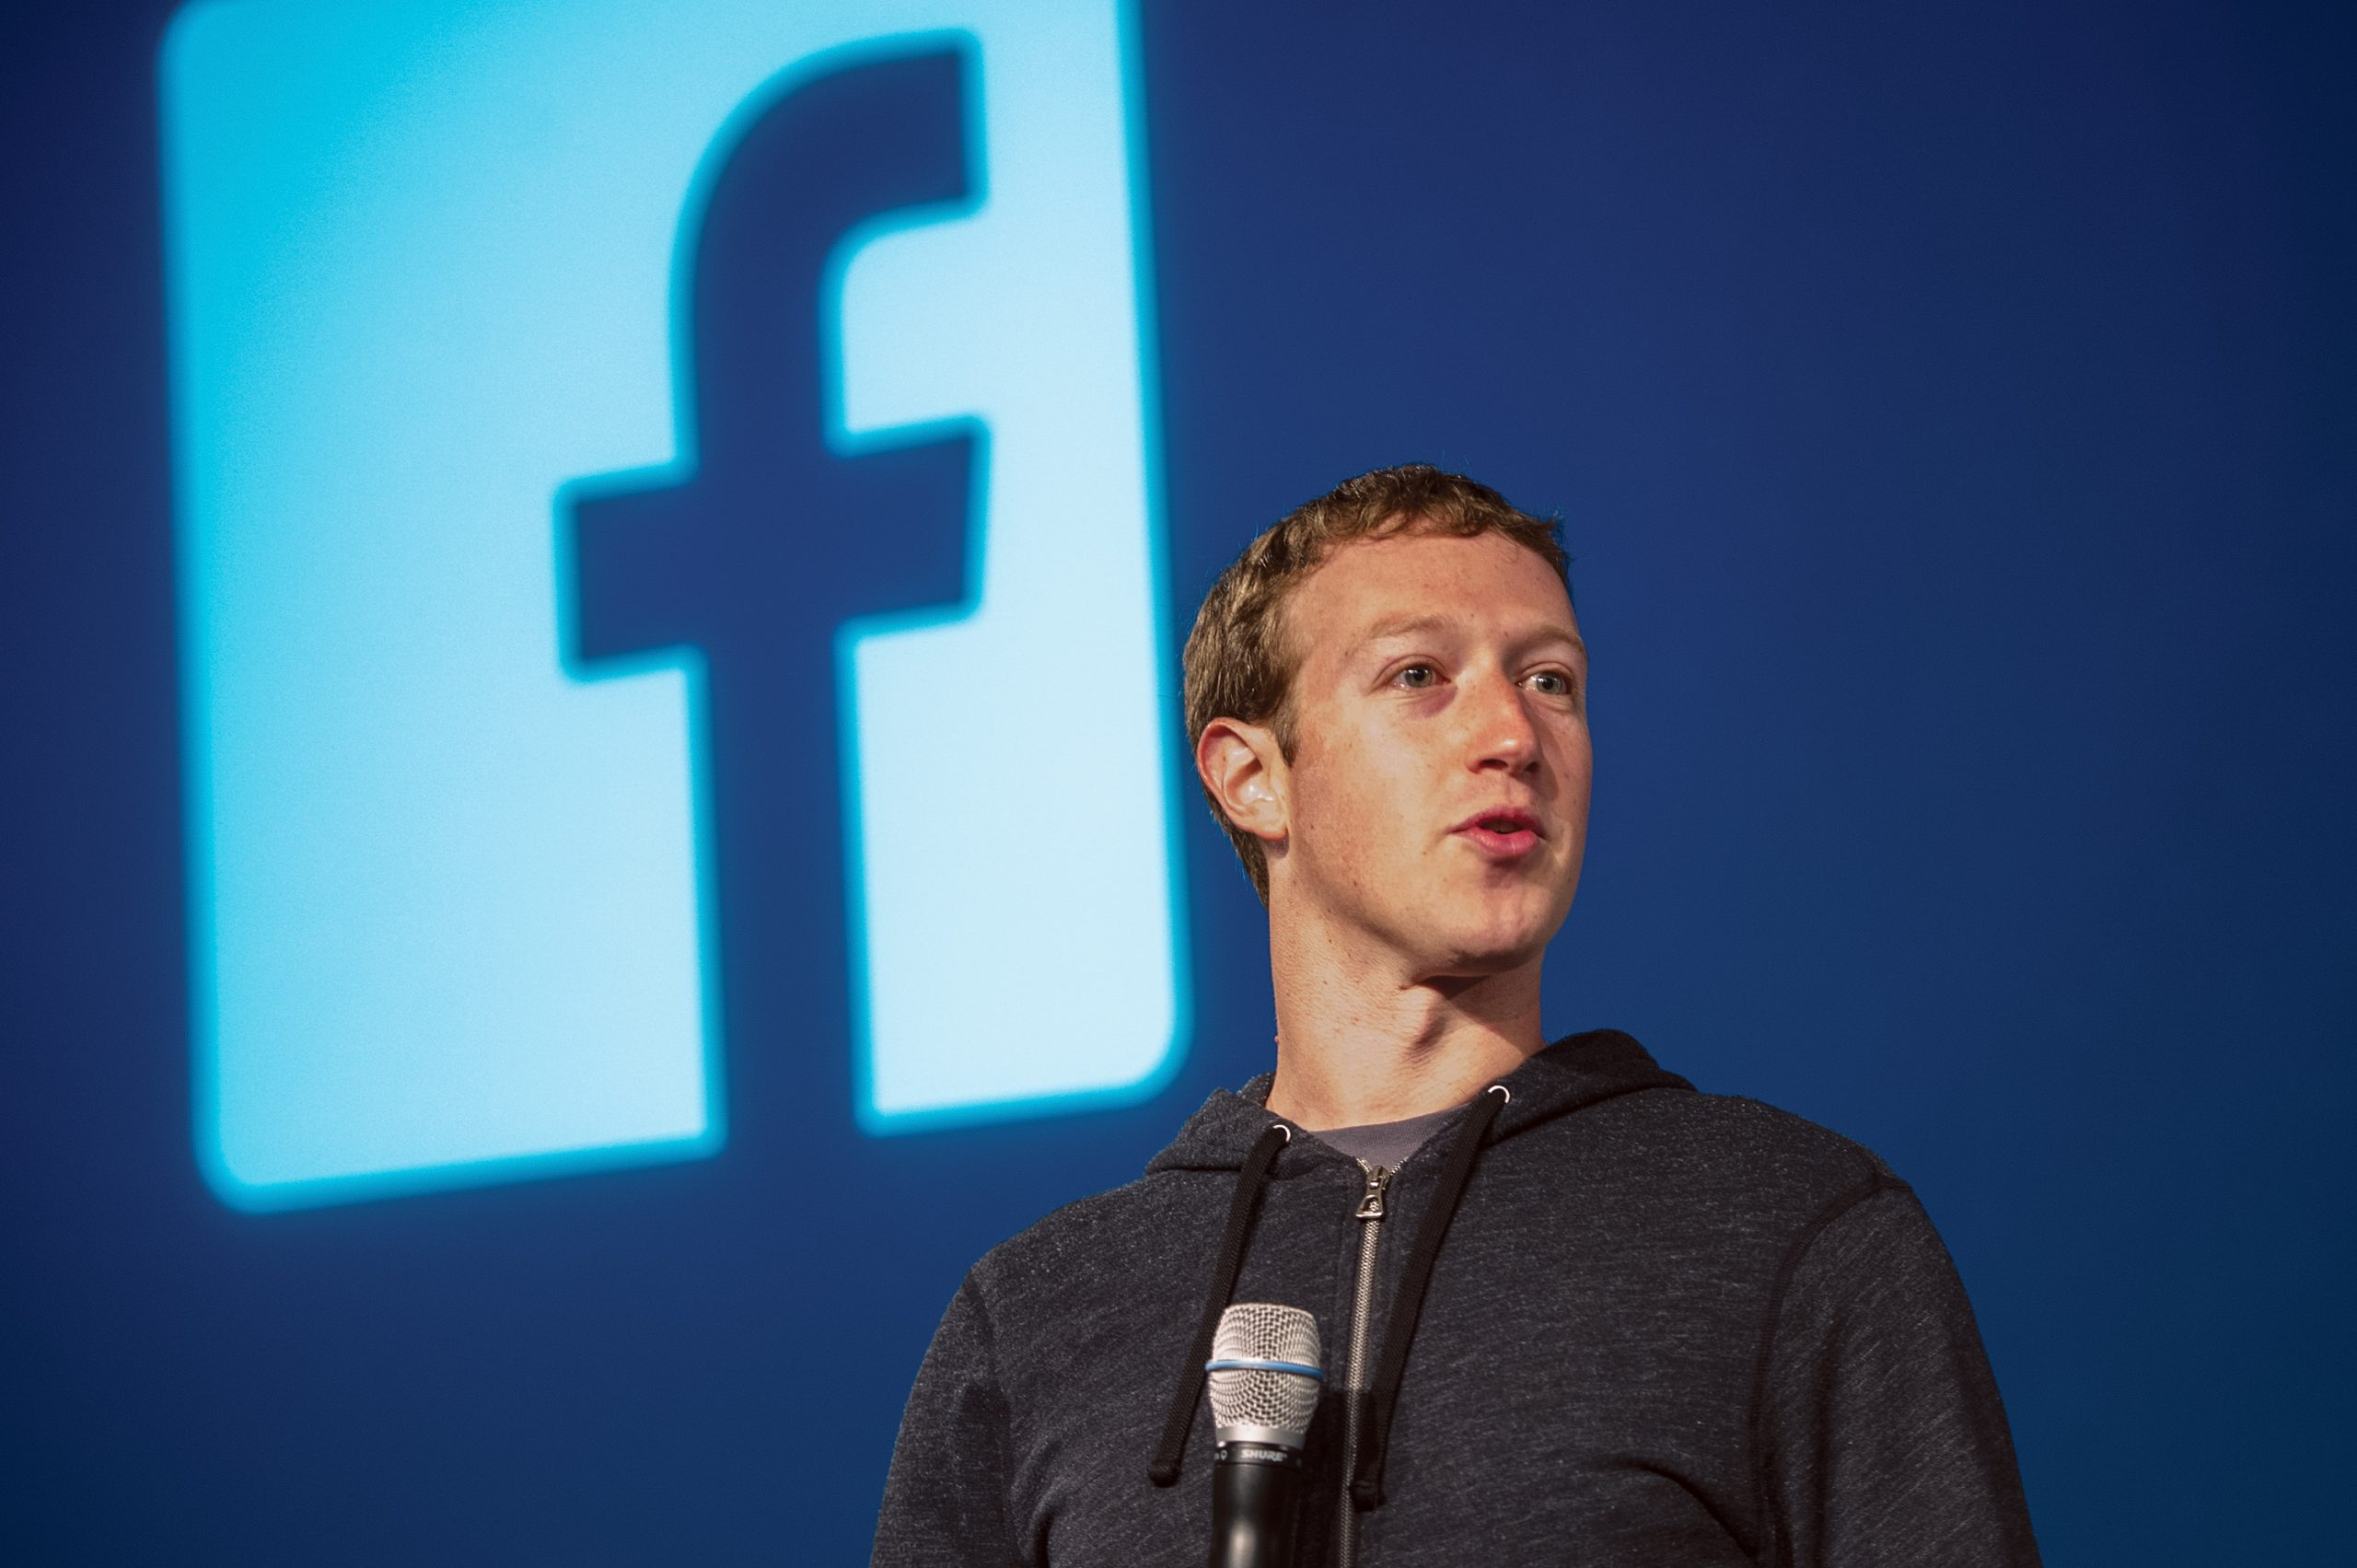 Mark Zuckerberg : Divisi Crypto Facebook Mungkin Membangun Sistem Identitas Blockchain